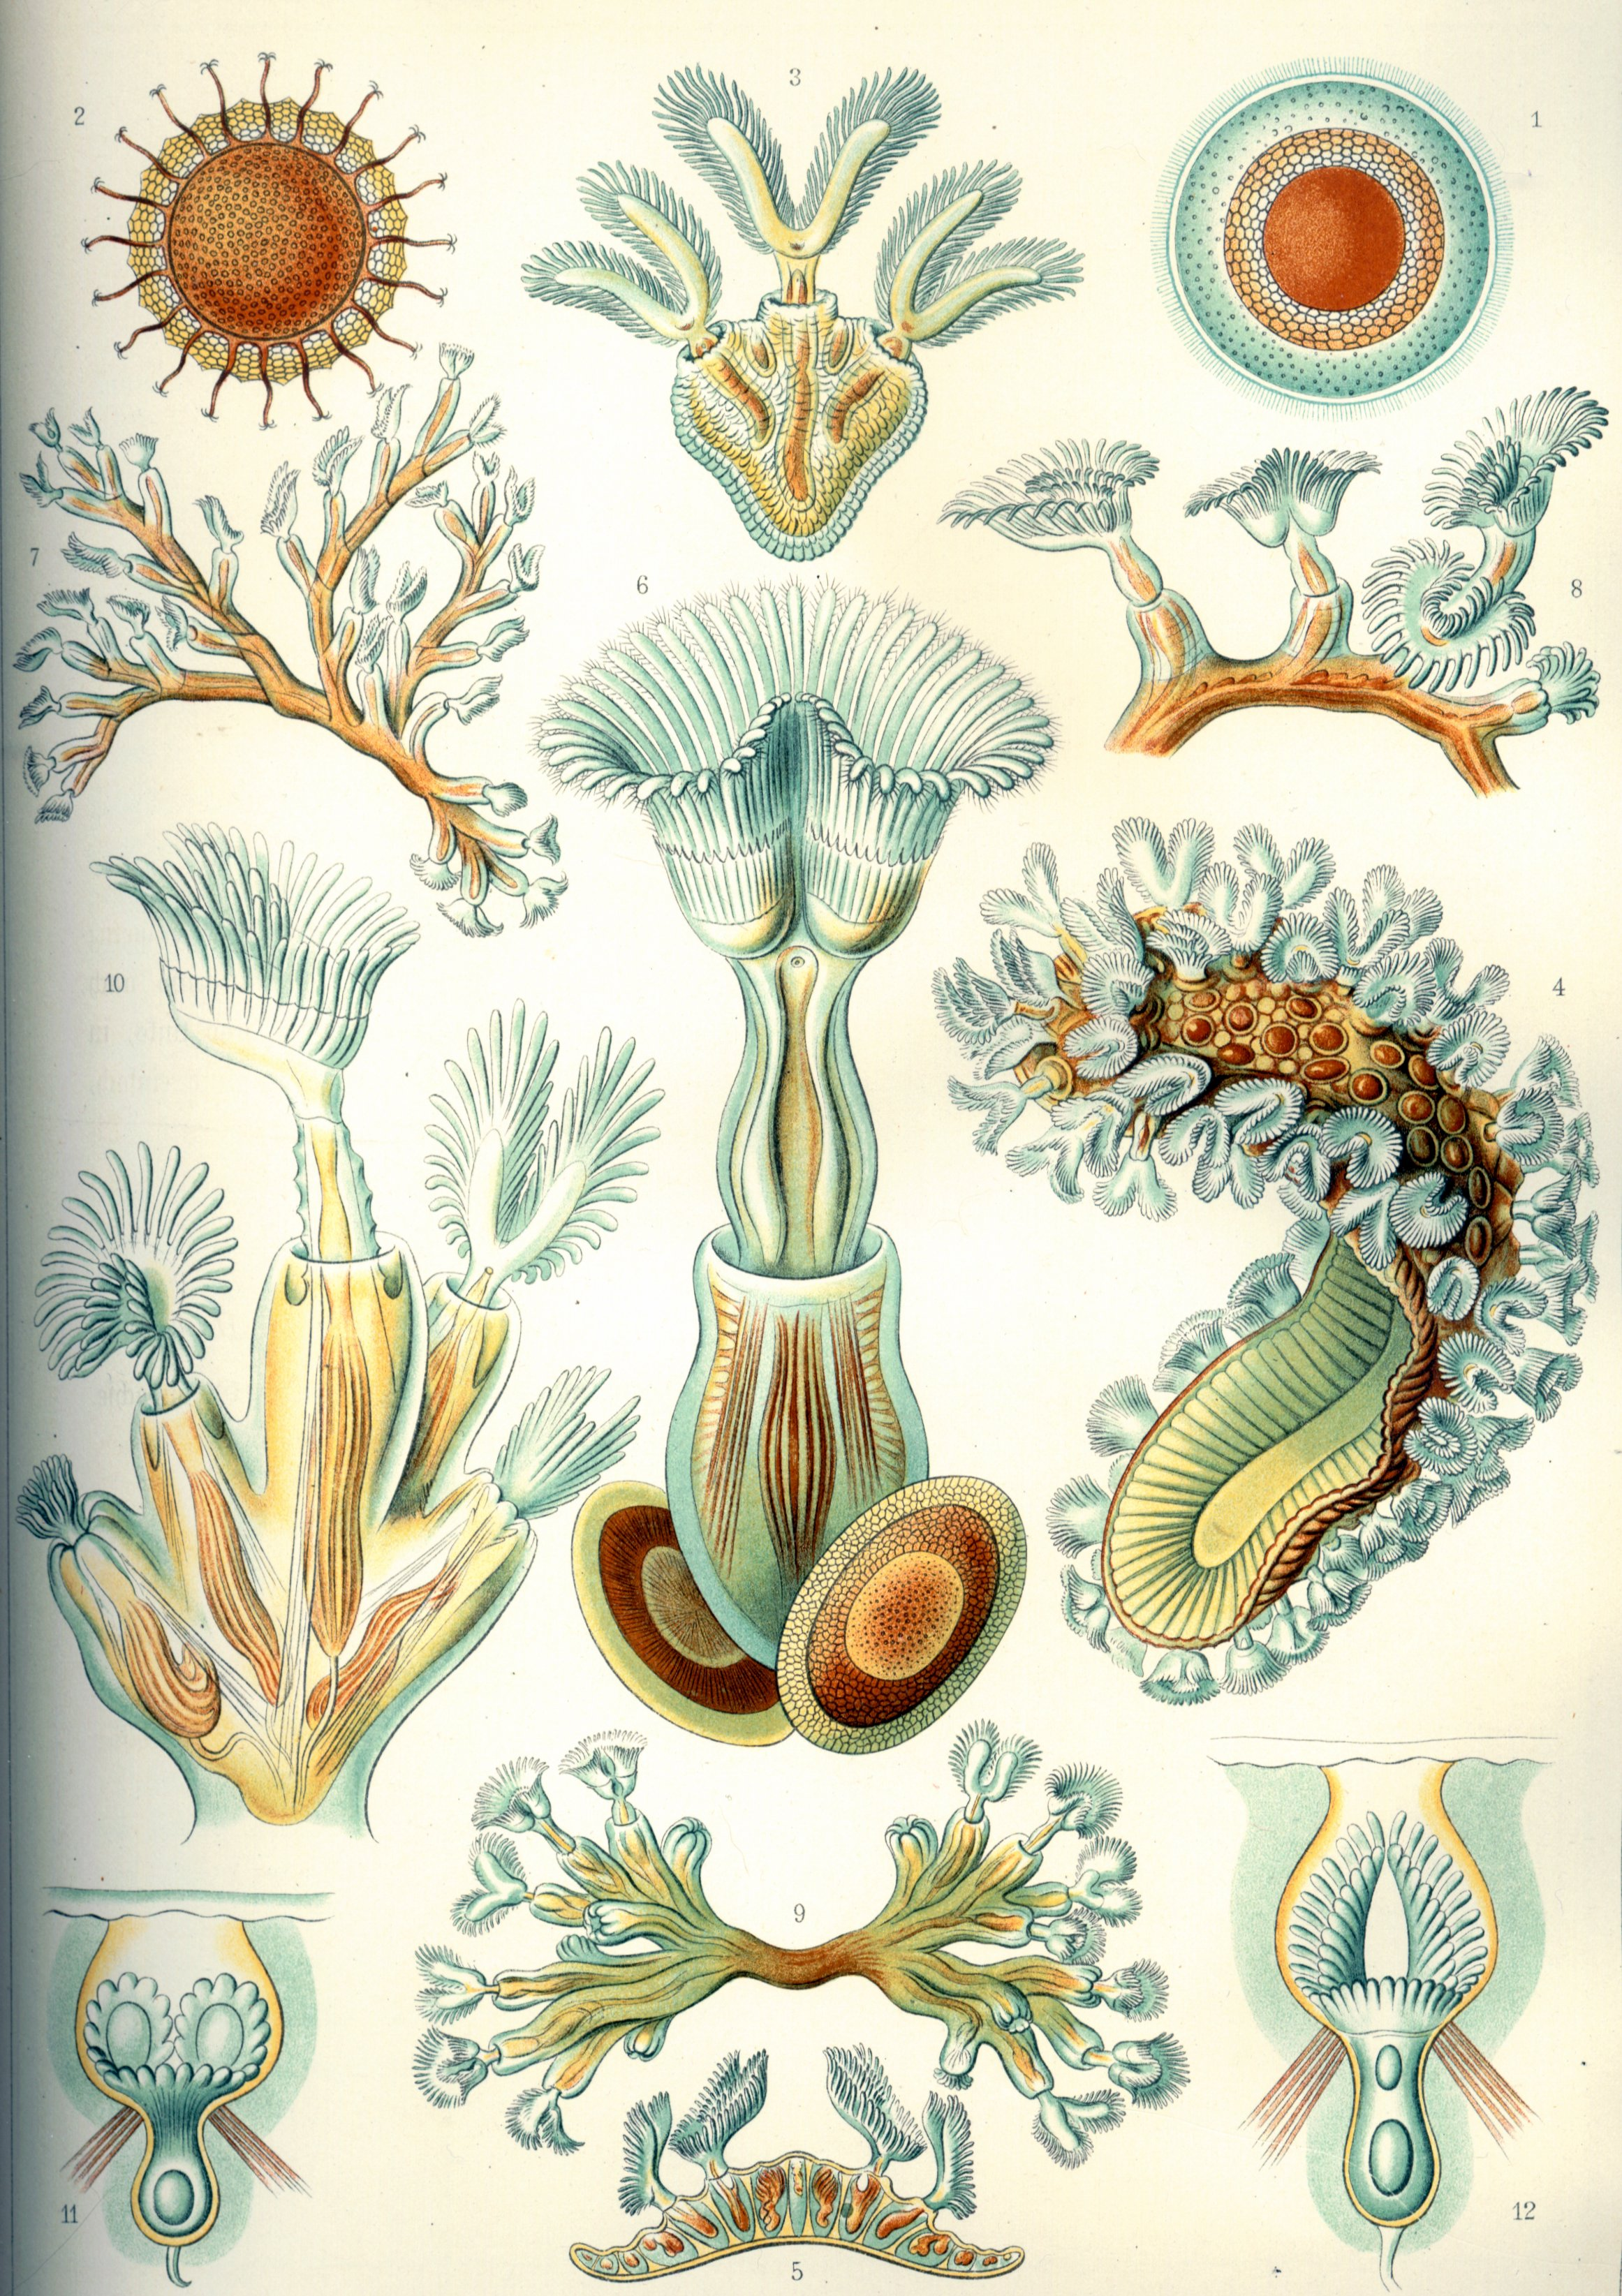 Depiction of Bryozoa